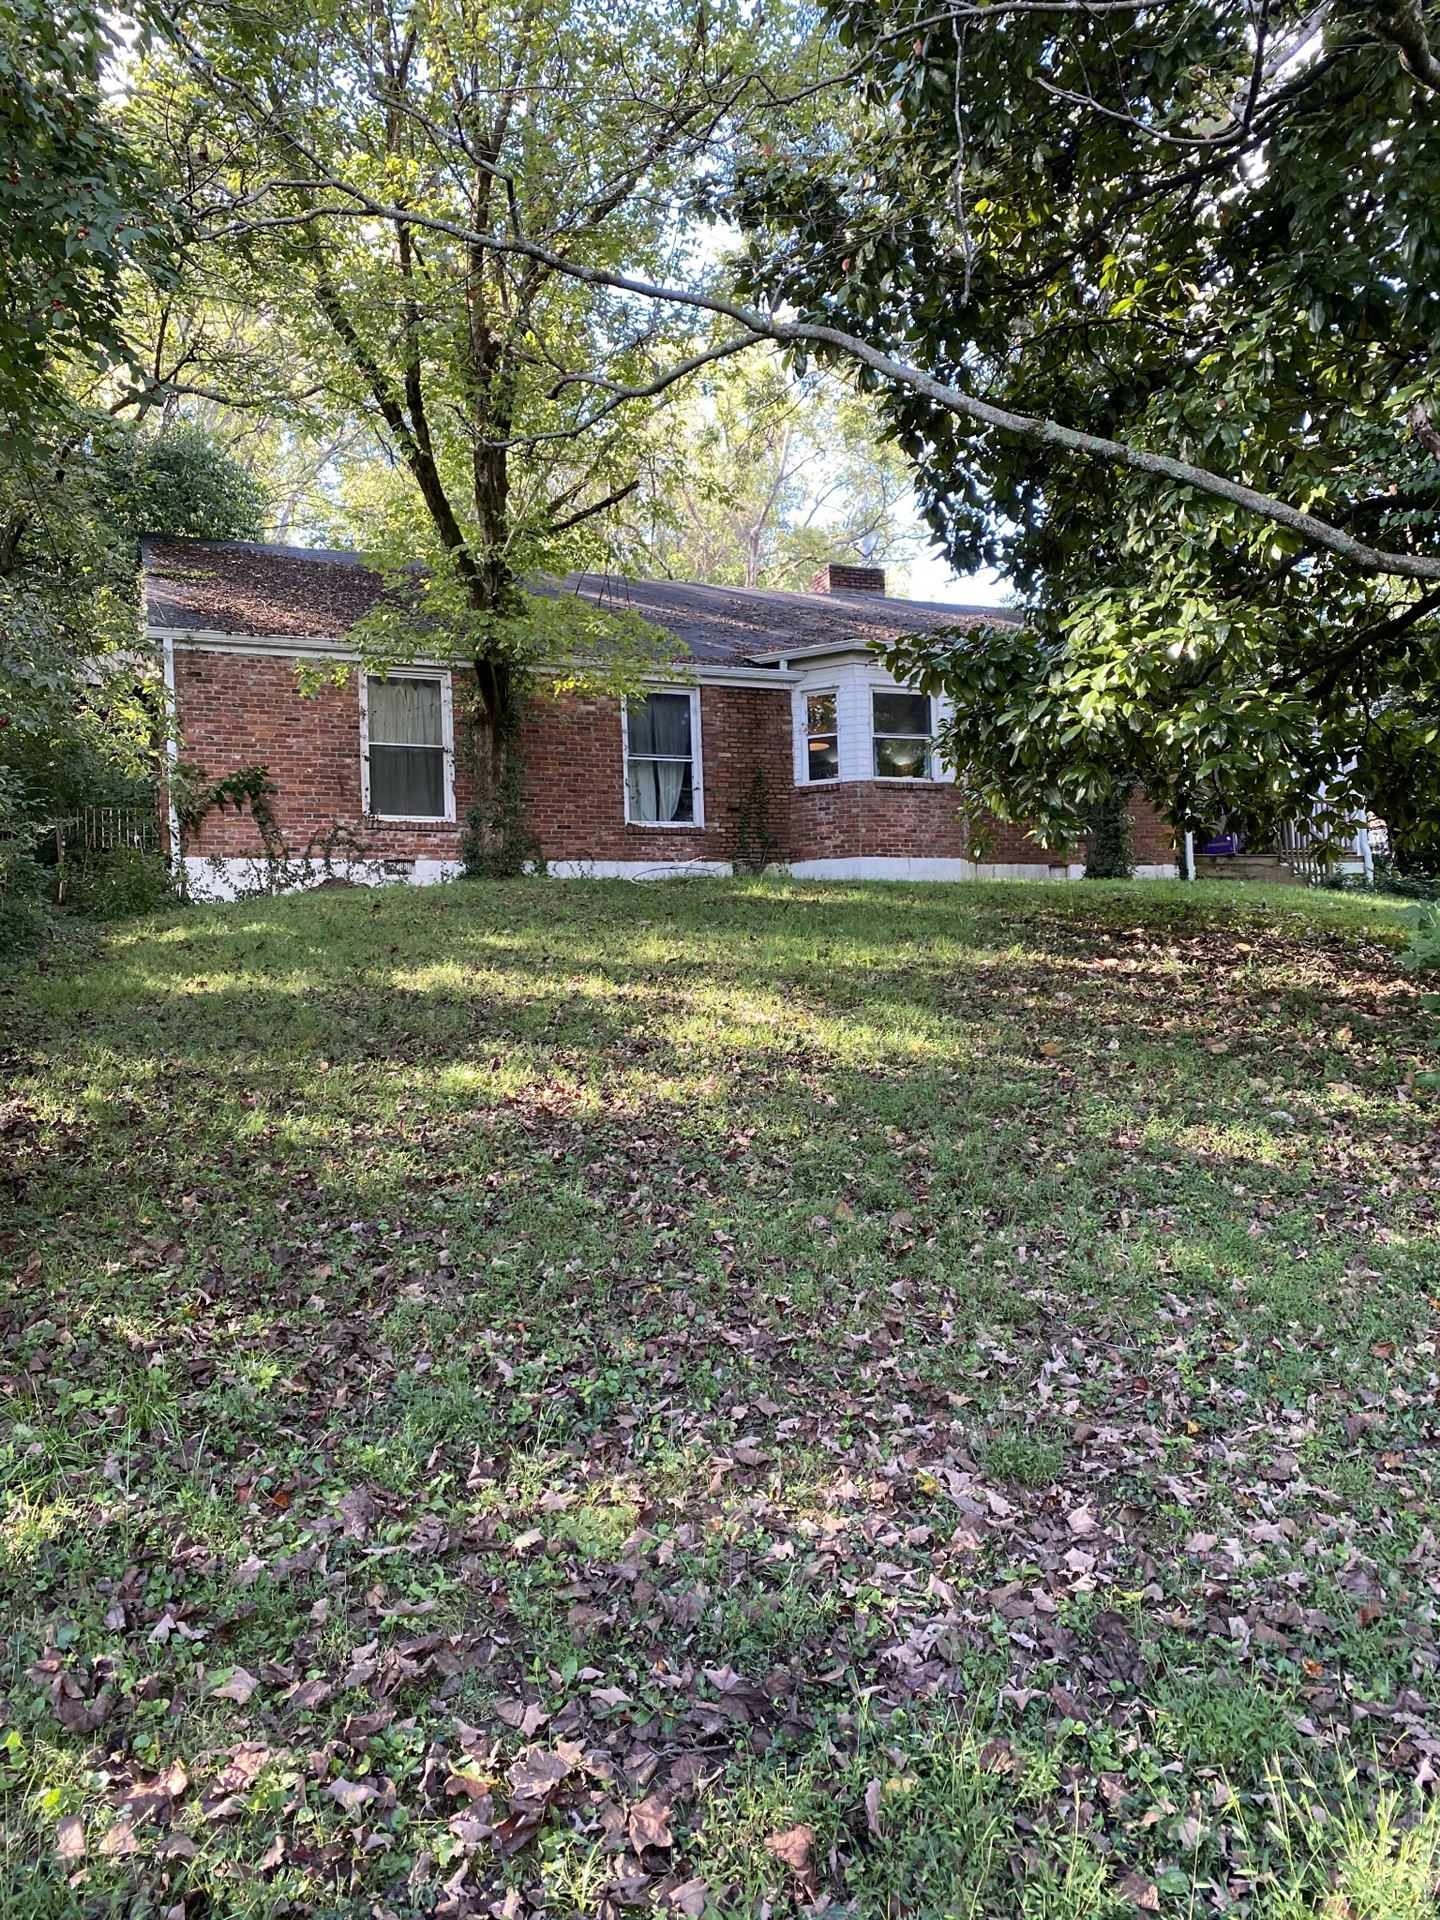 Photo of 822 Sutton Hill Rd, Nashville, TN 37204 (MLS # 2299865)